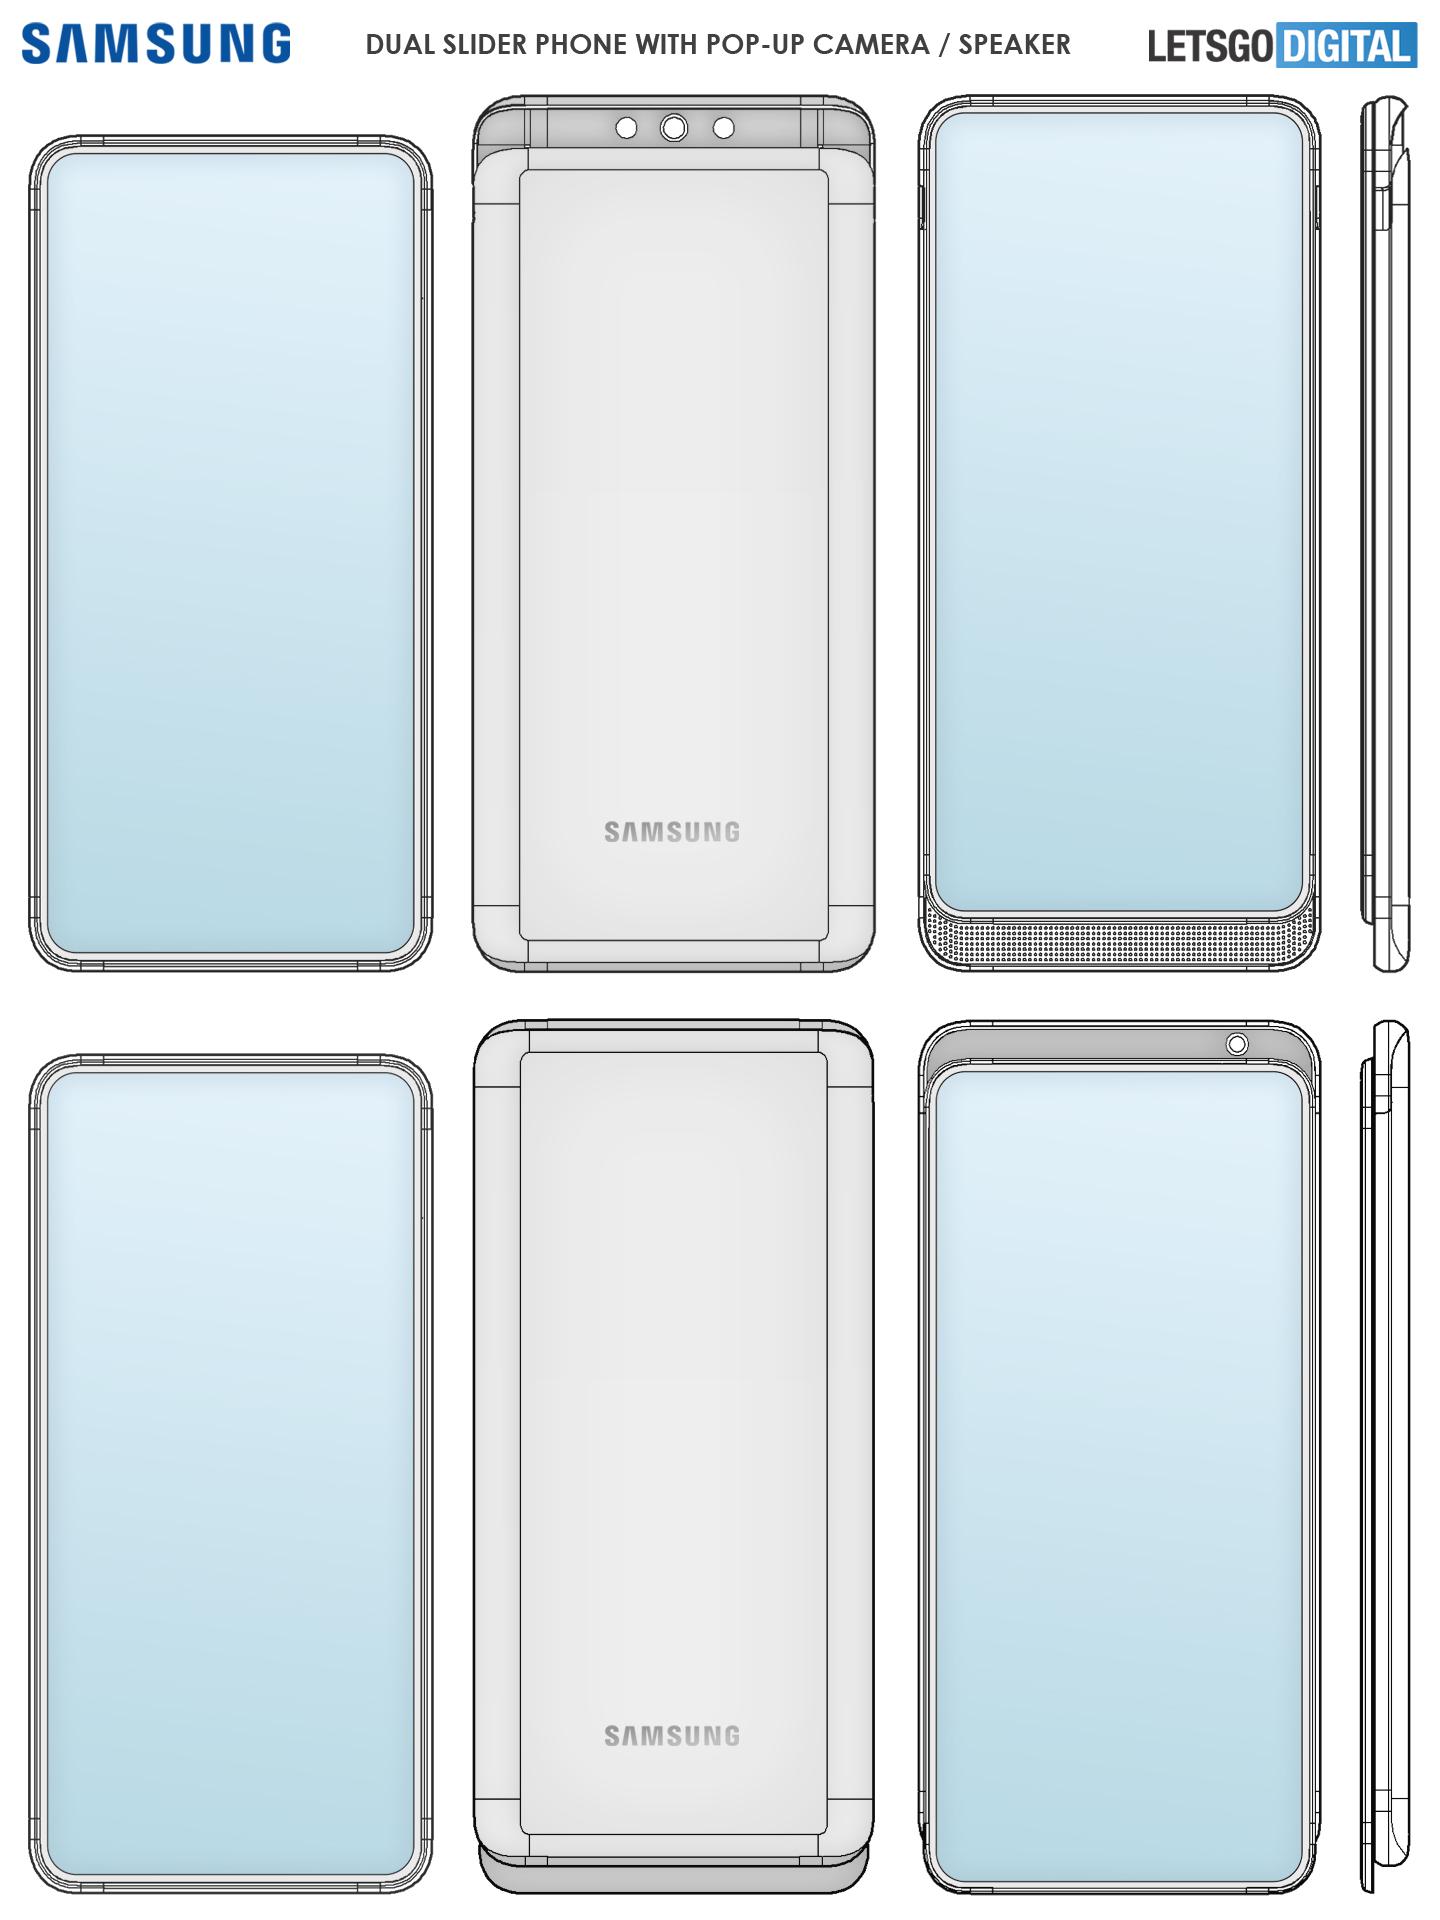 Samsung dual slider smartphone